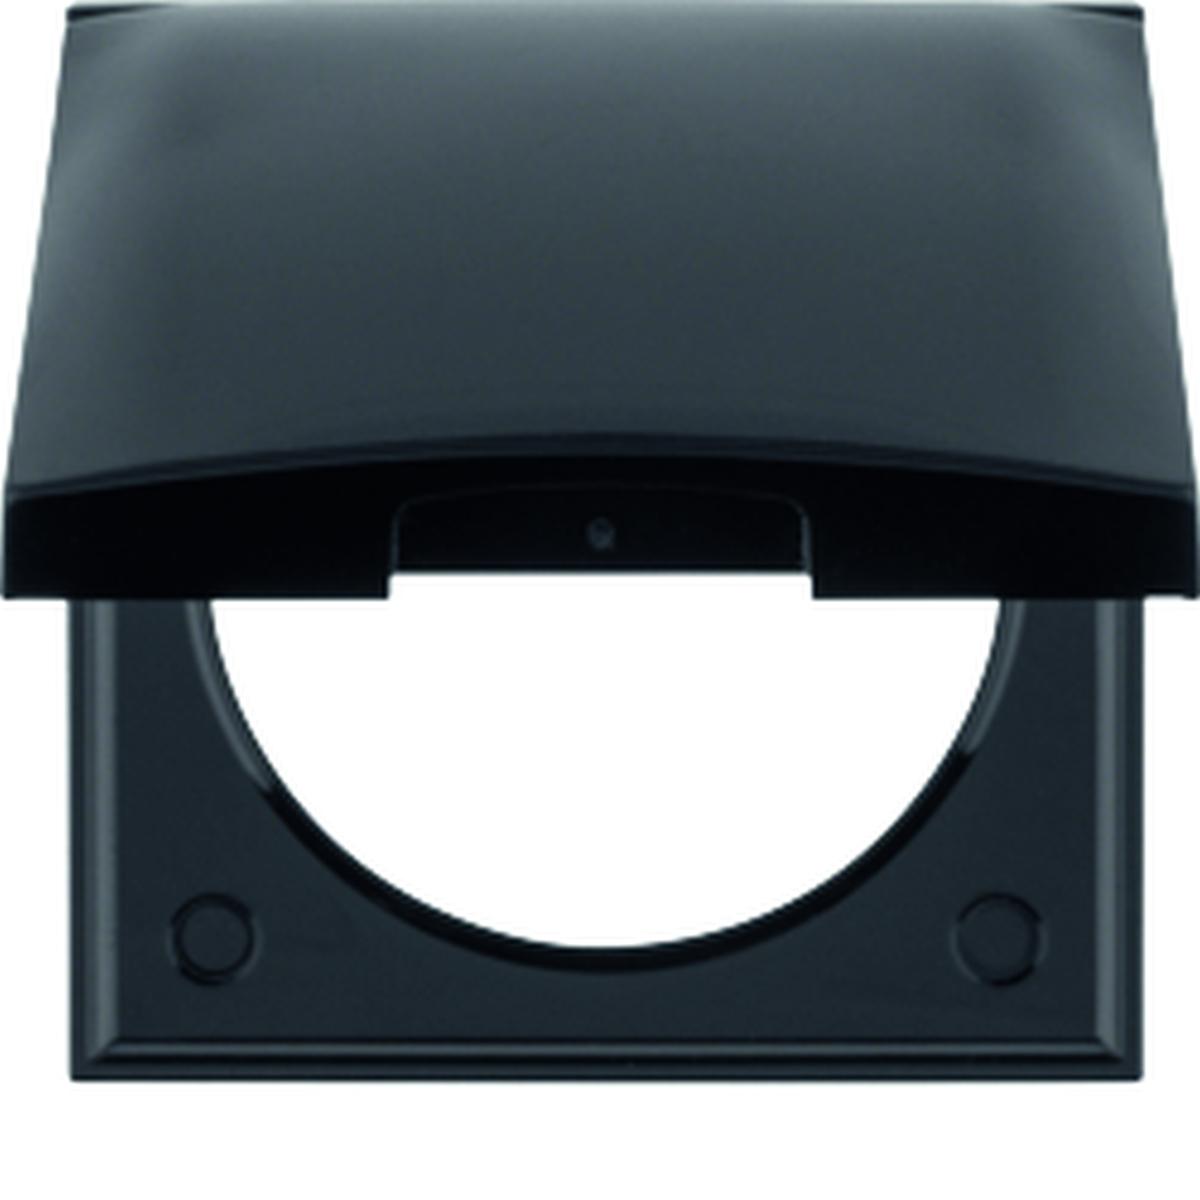 Berker Rahmen mit Deckel INTEGRO schwarz